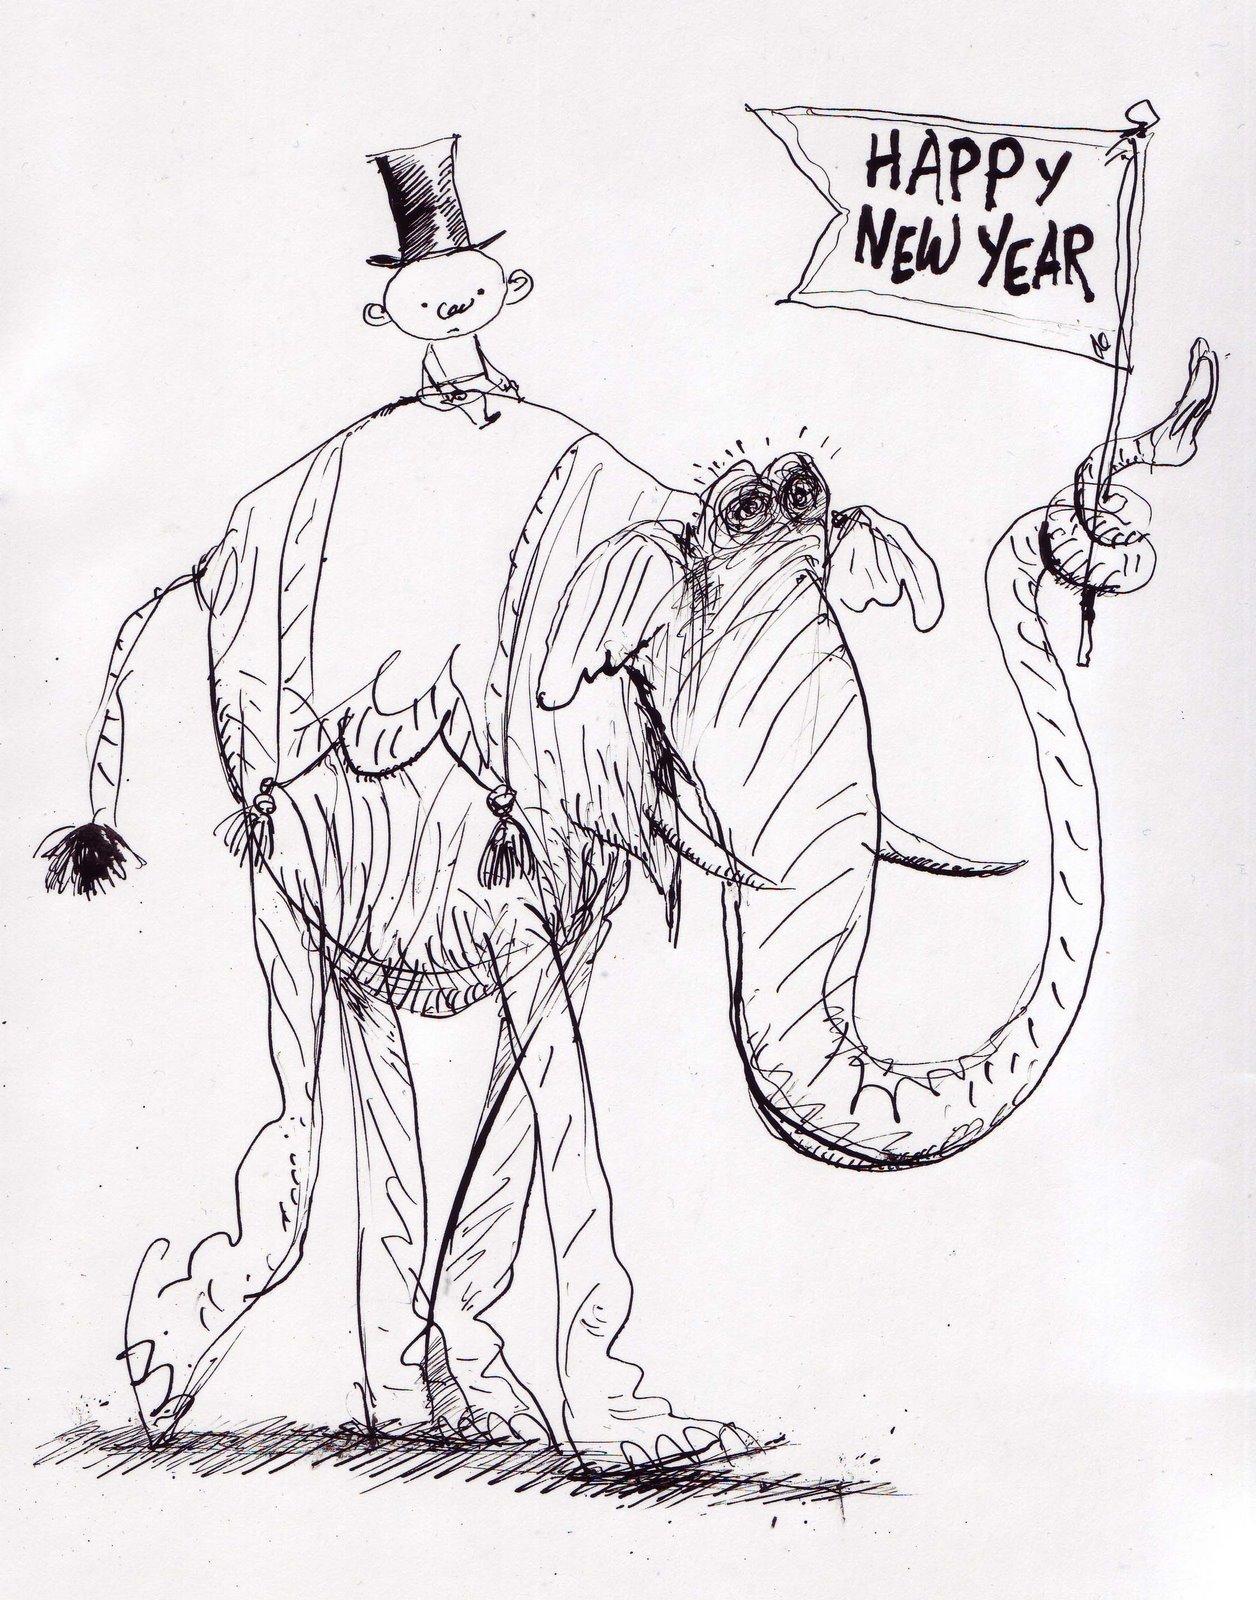 cul de sac: Happy New Year